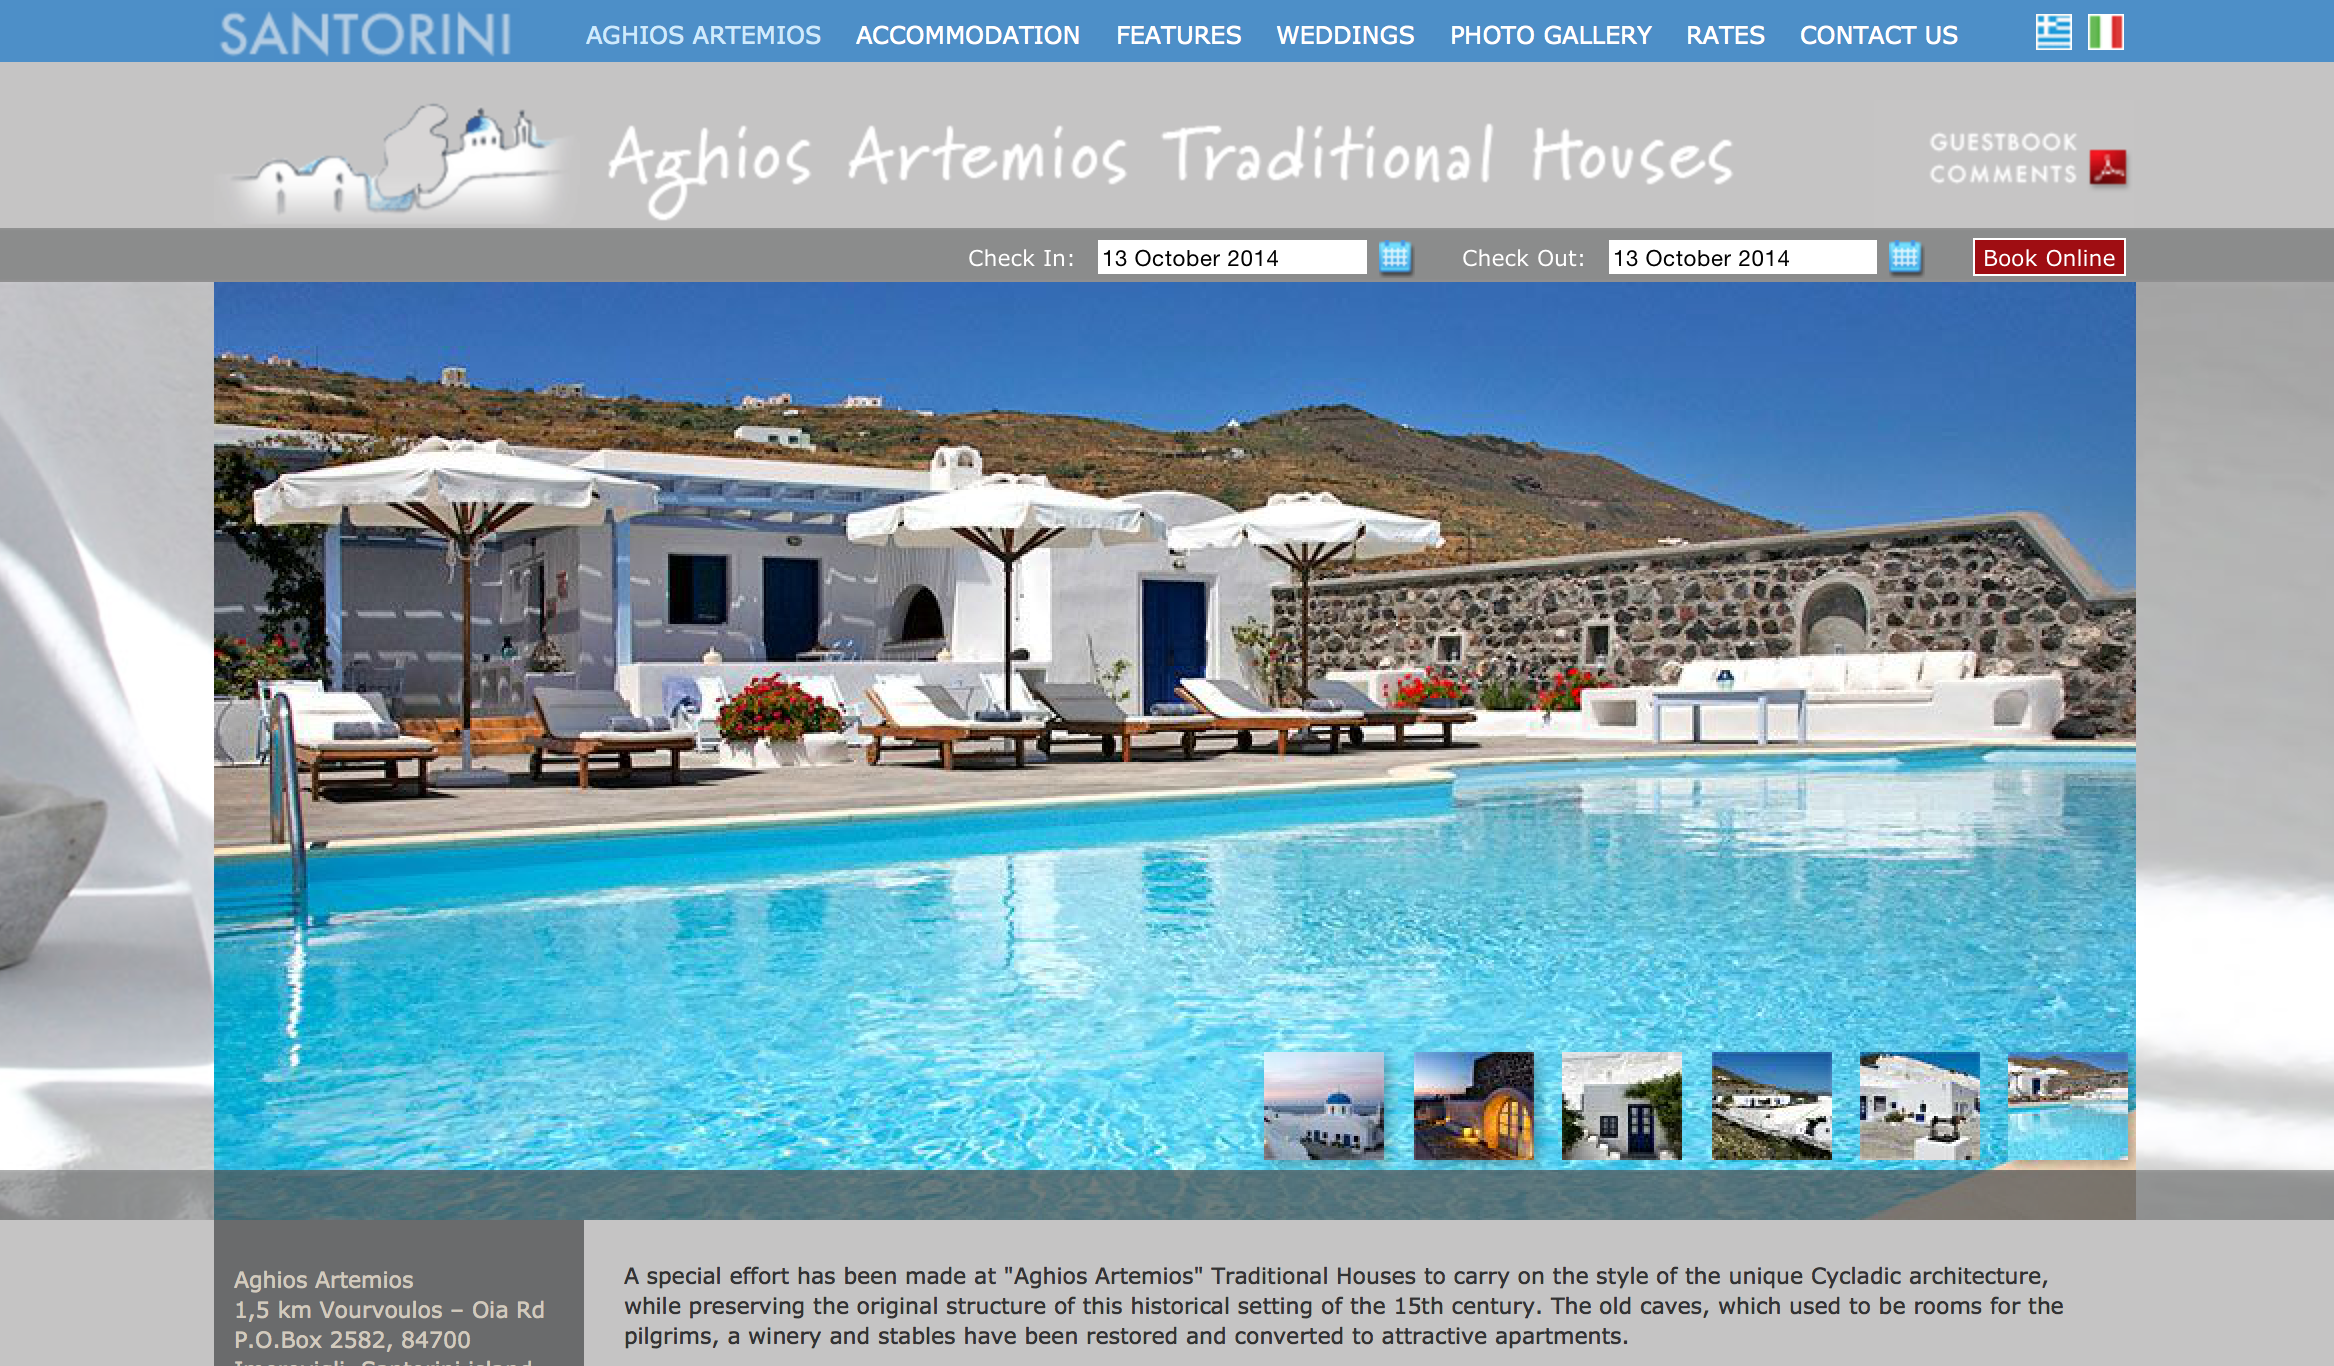 San Artemis